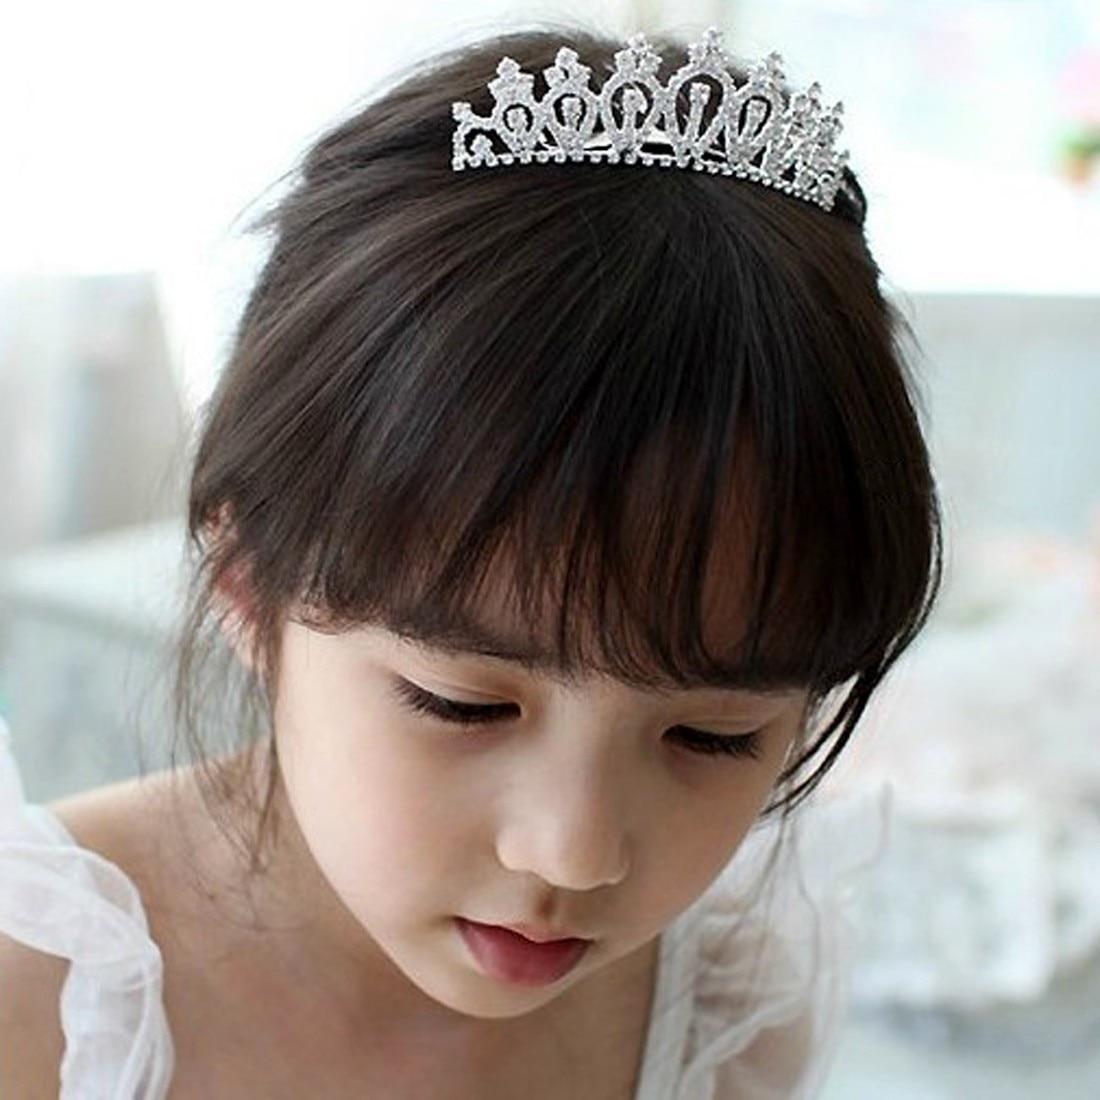 Excellent Quality Womens Bridal Crystal Rhinestone Hair